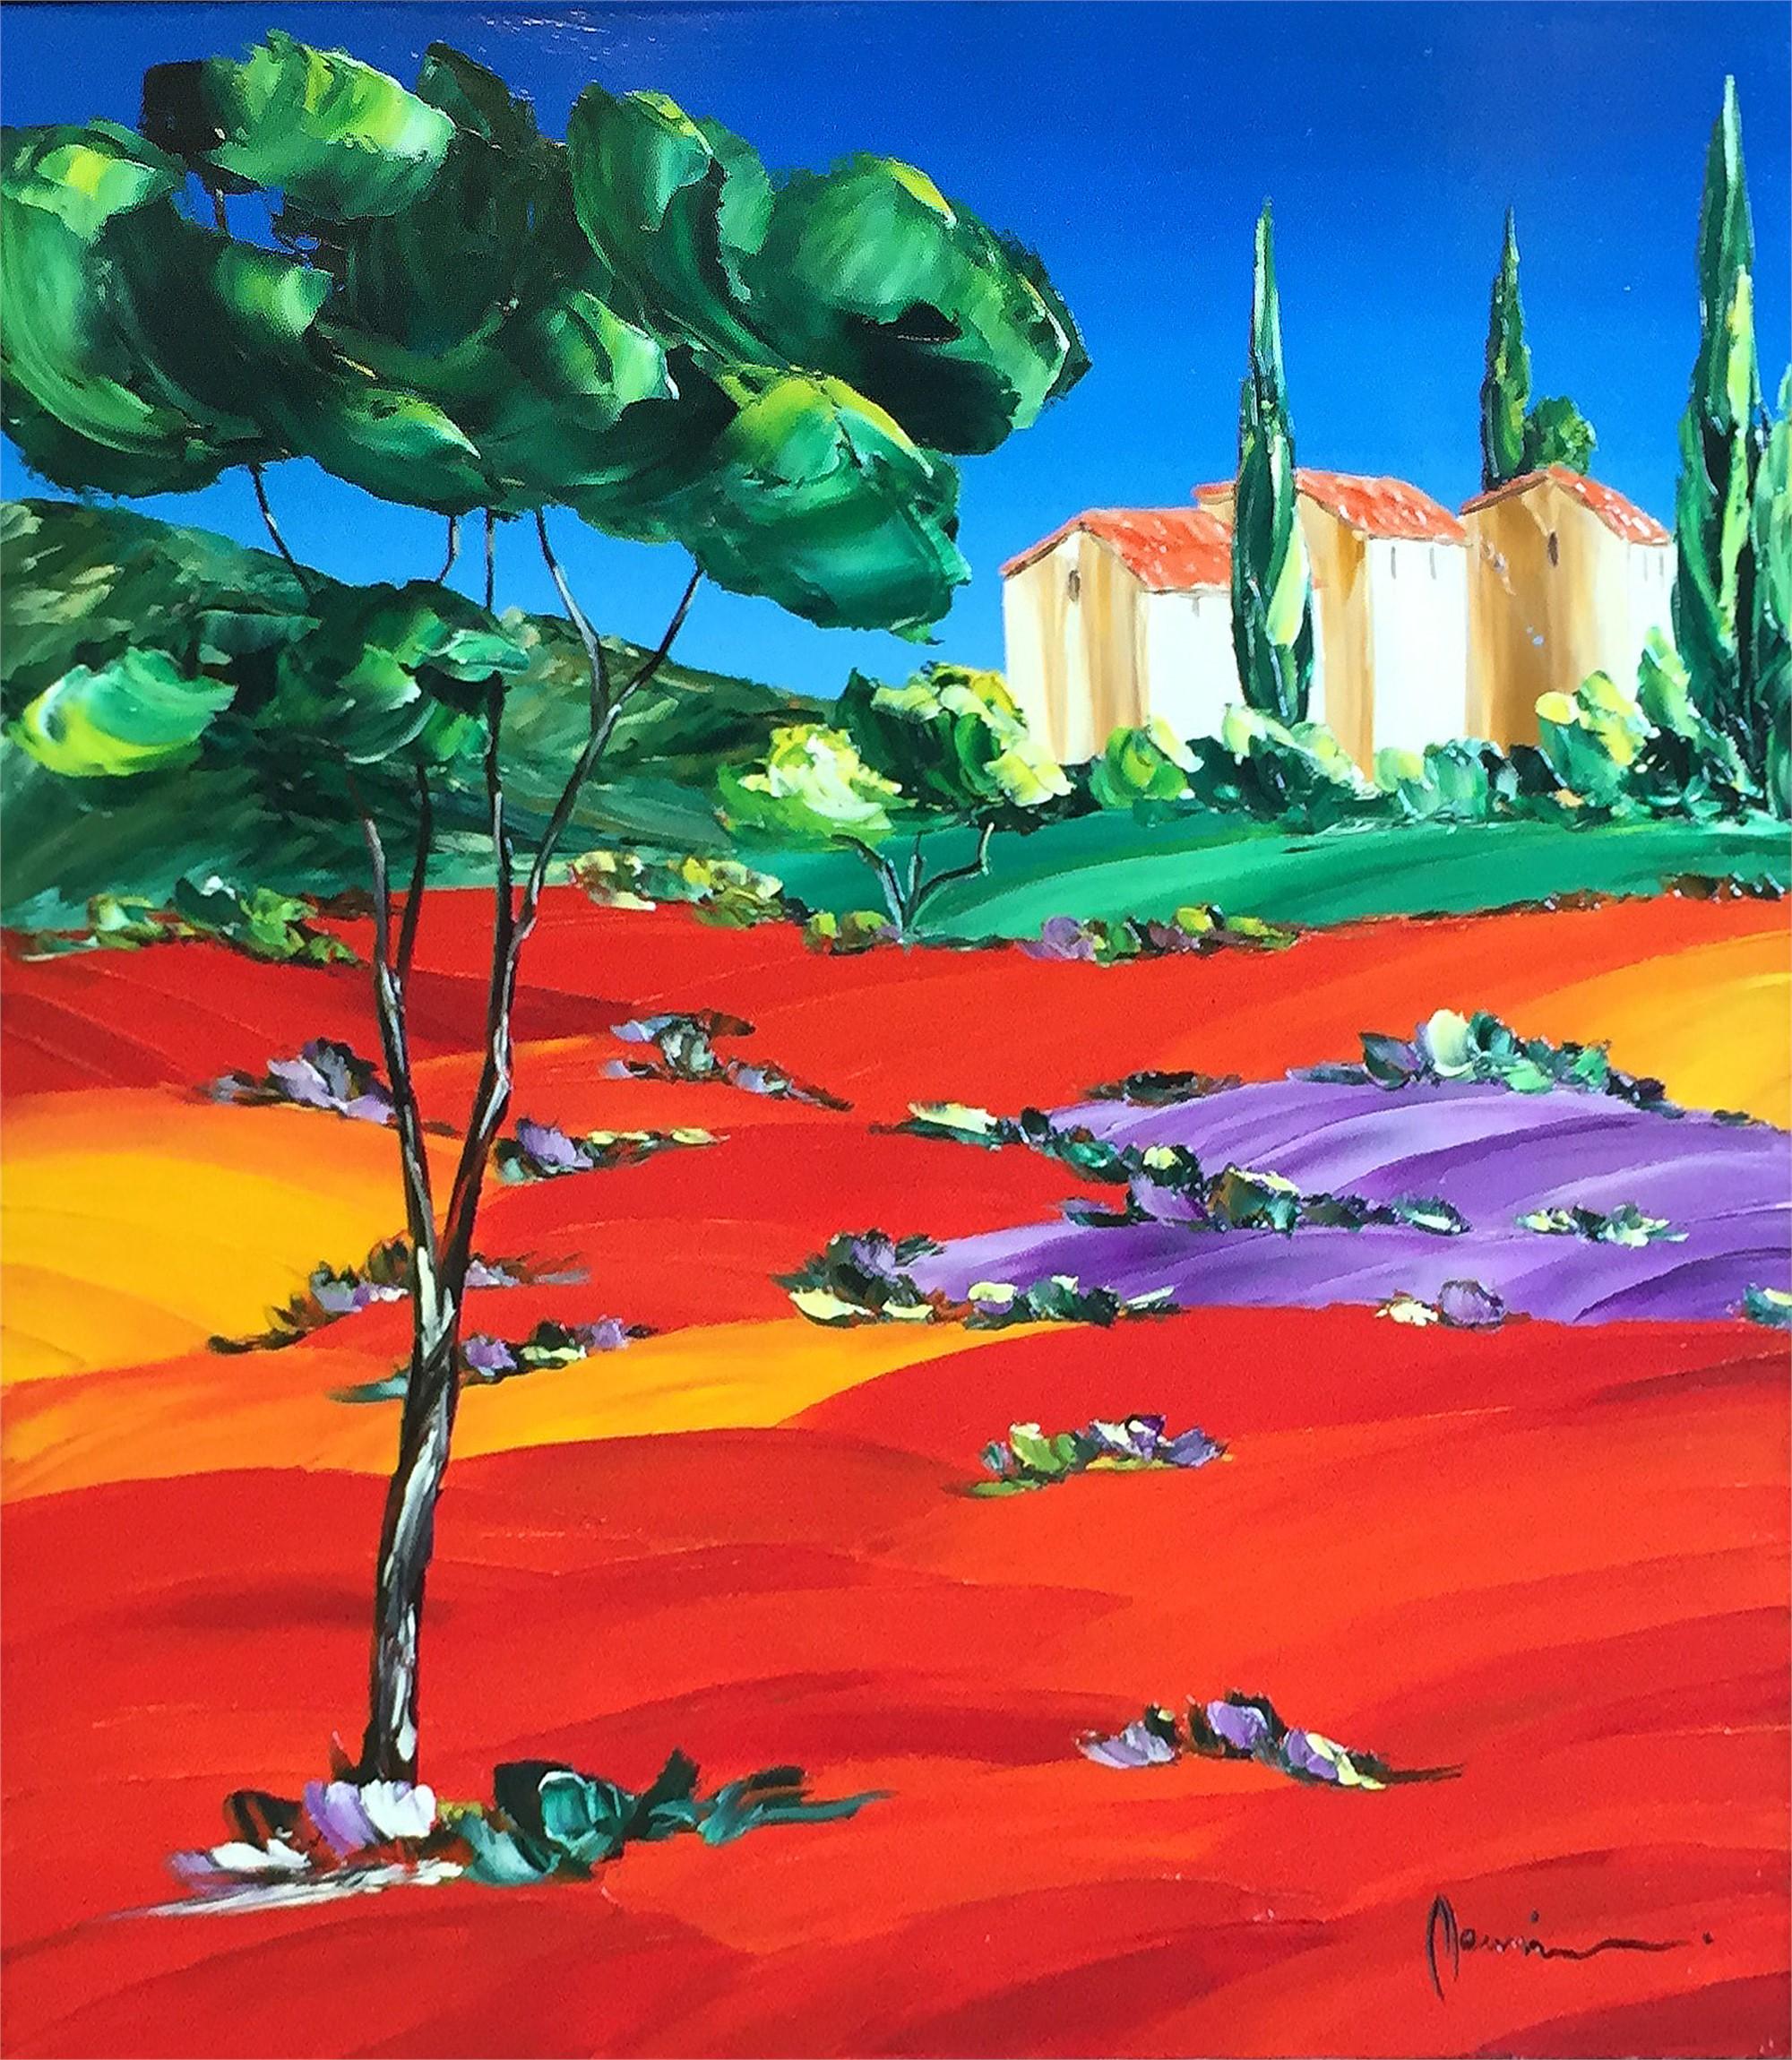 Poppies by Monika Meunier